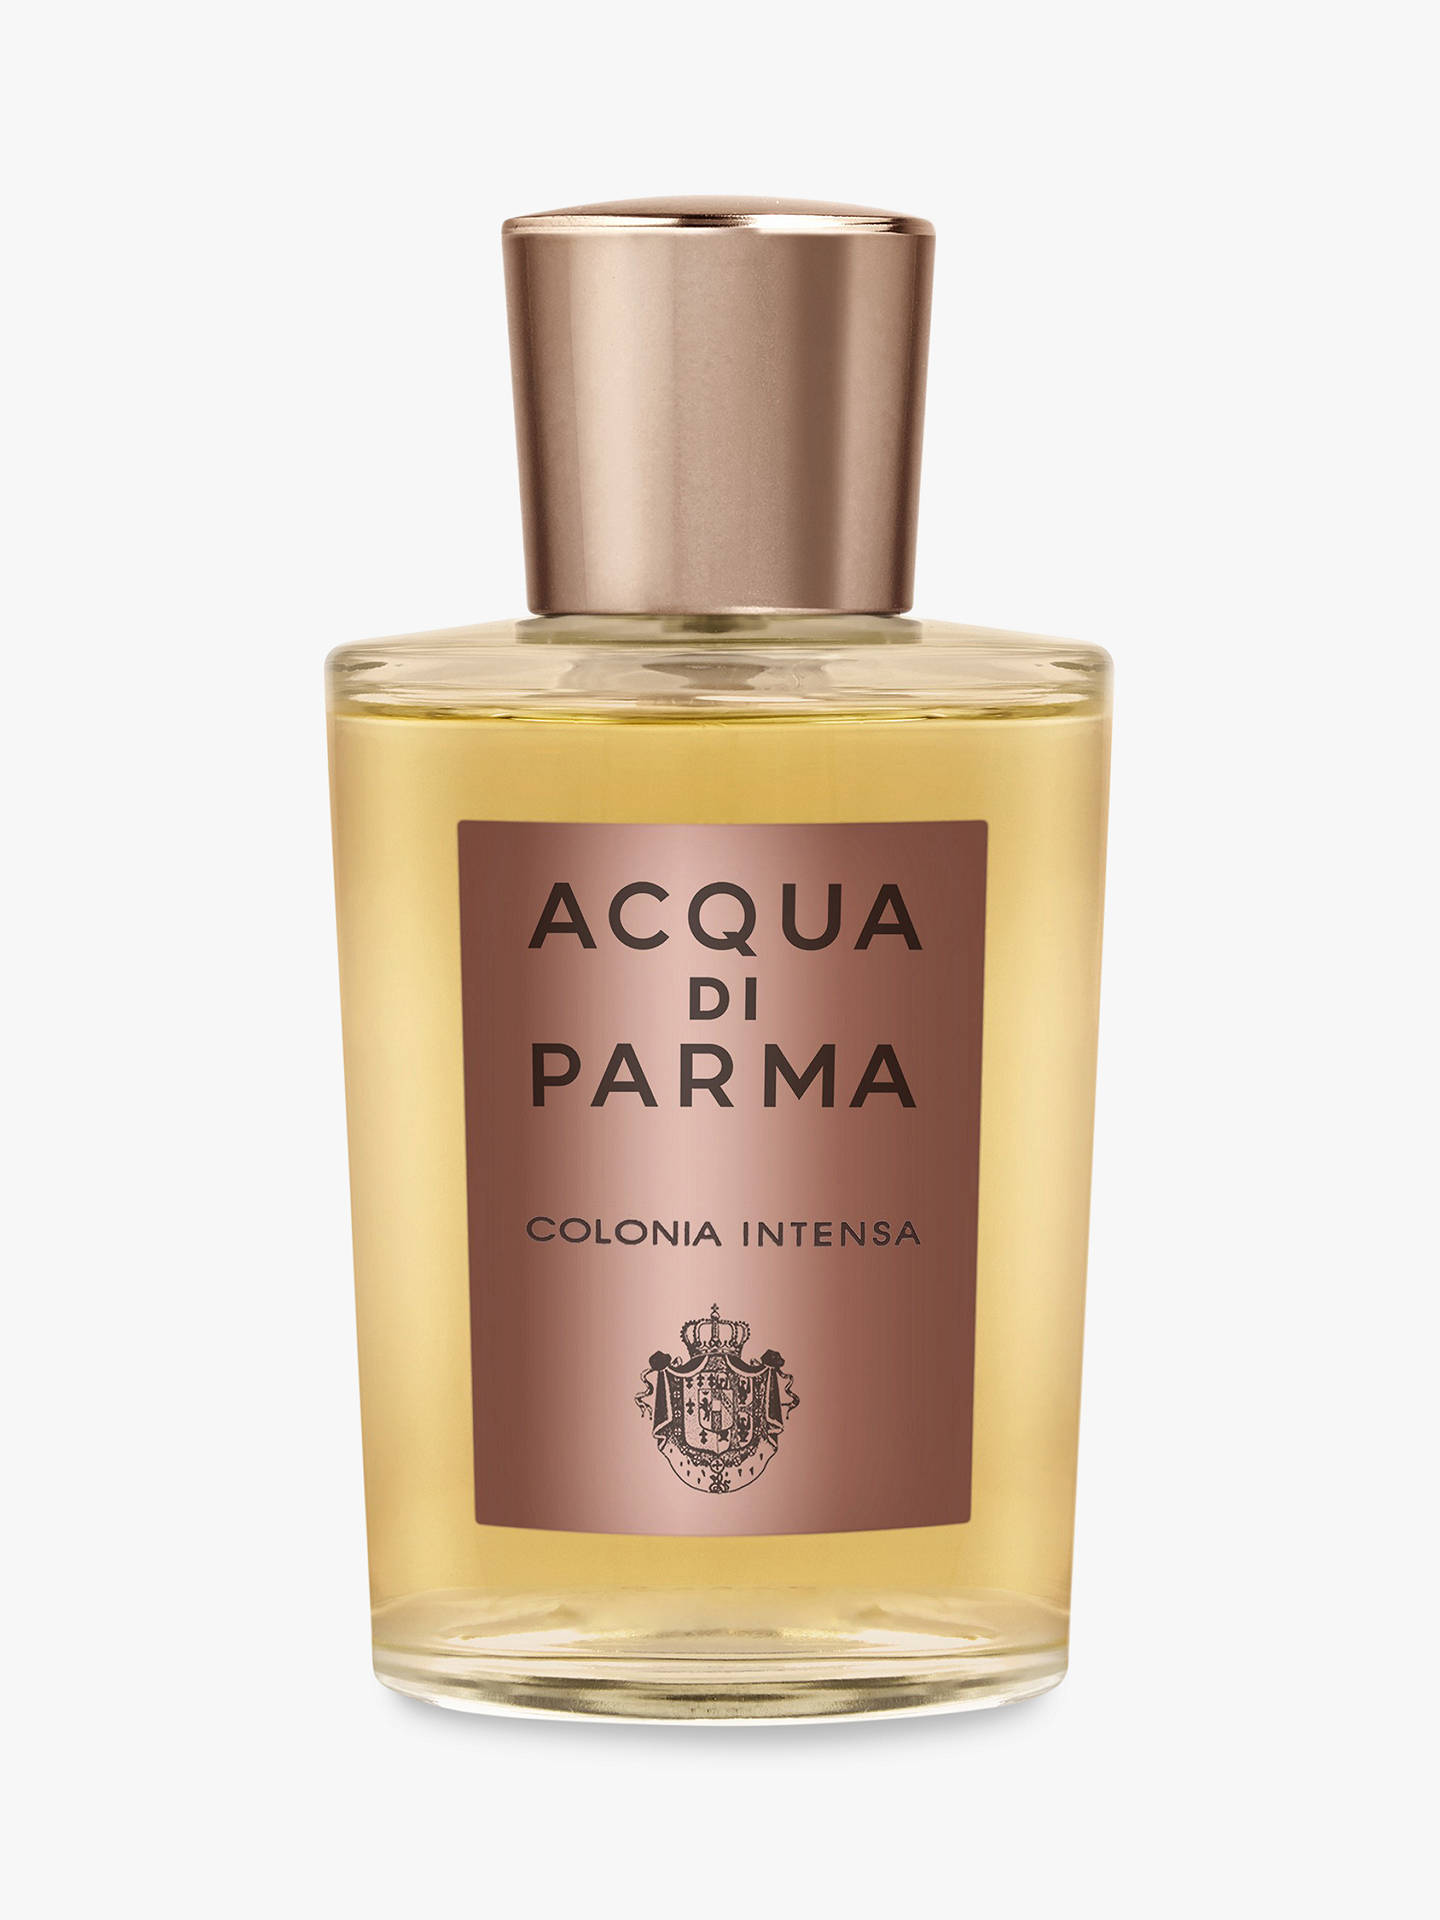 6aba459a5113 Acqua di Parma Colonia Intensa Eau de Cologne at John Lewis   Partners